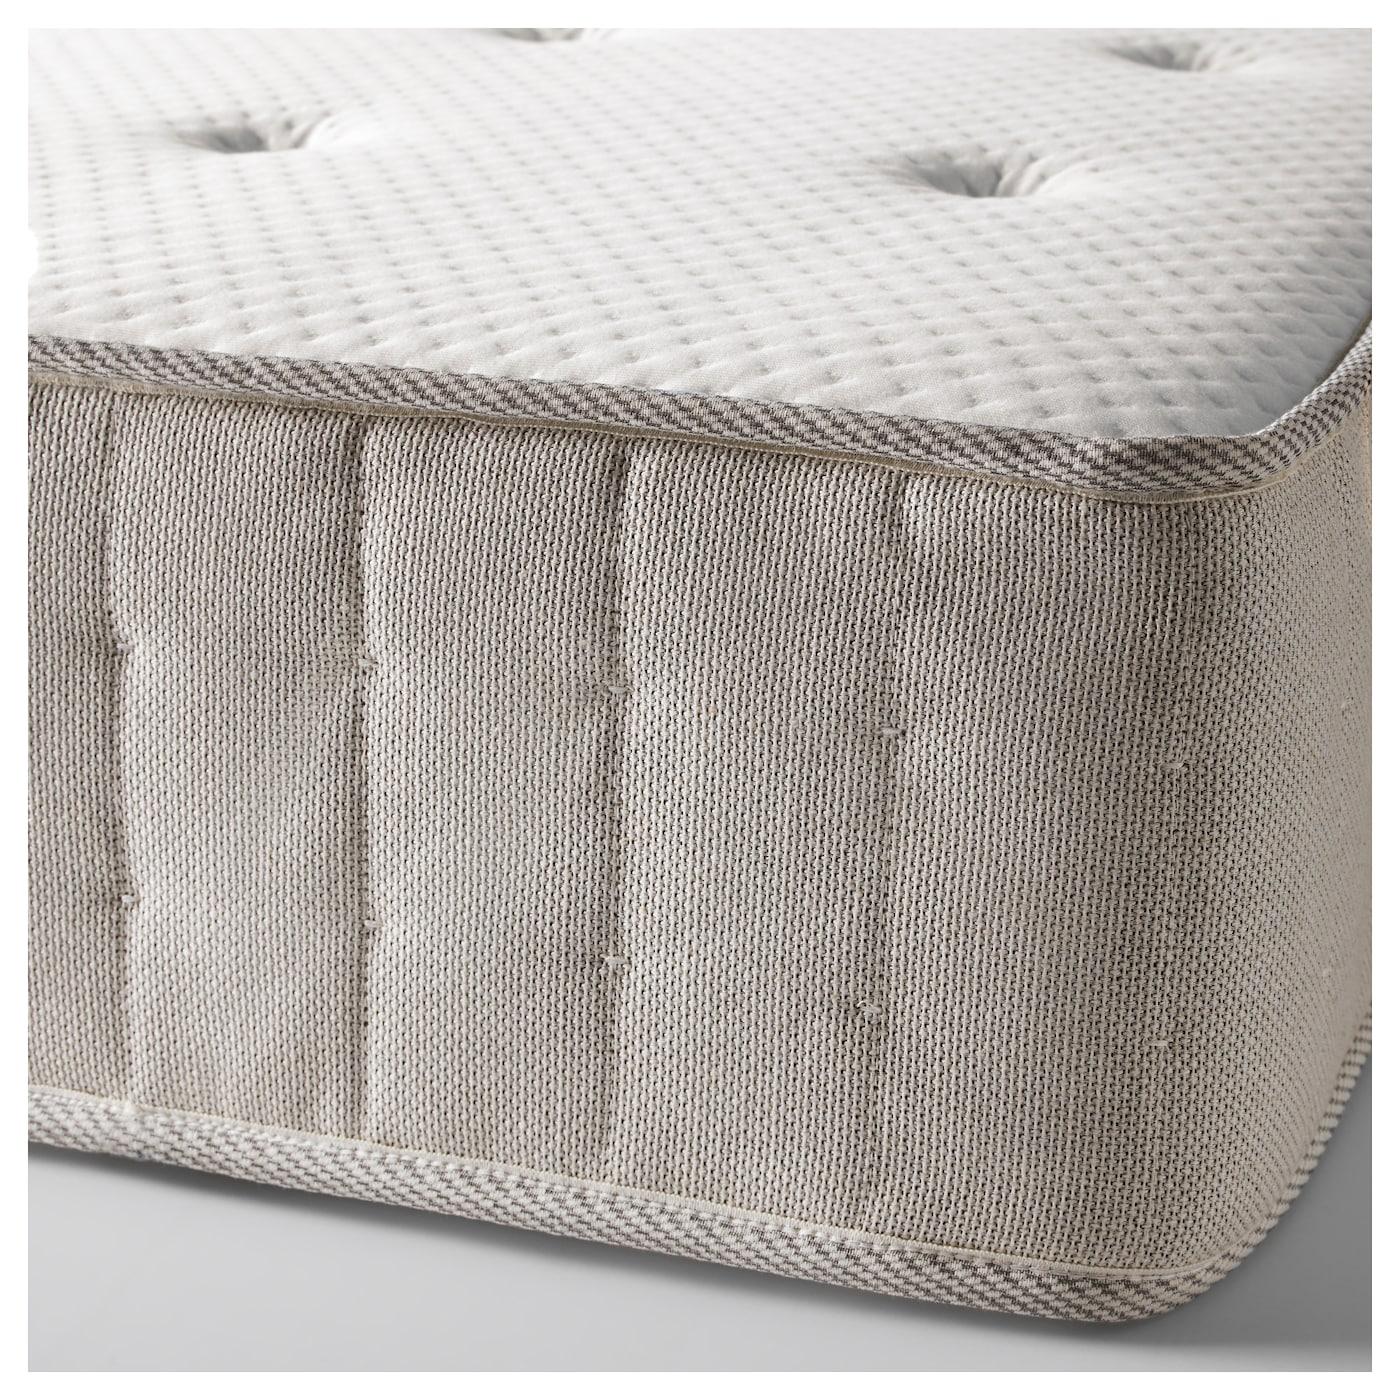 hesseng pocket sprung mattress medium firm natural colour 160x200 cm ikea. Black Bedroom Furniture Sets. Home Design Ideas